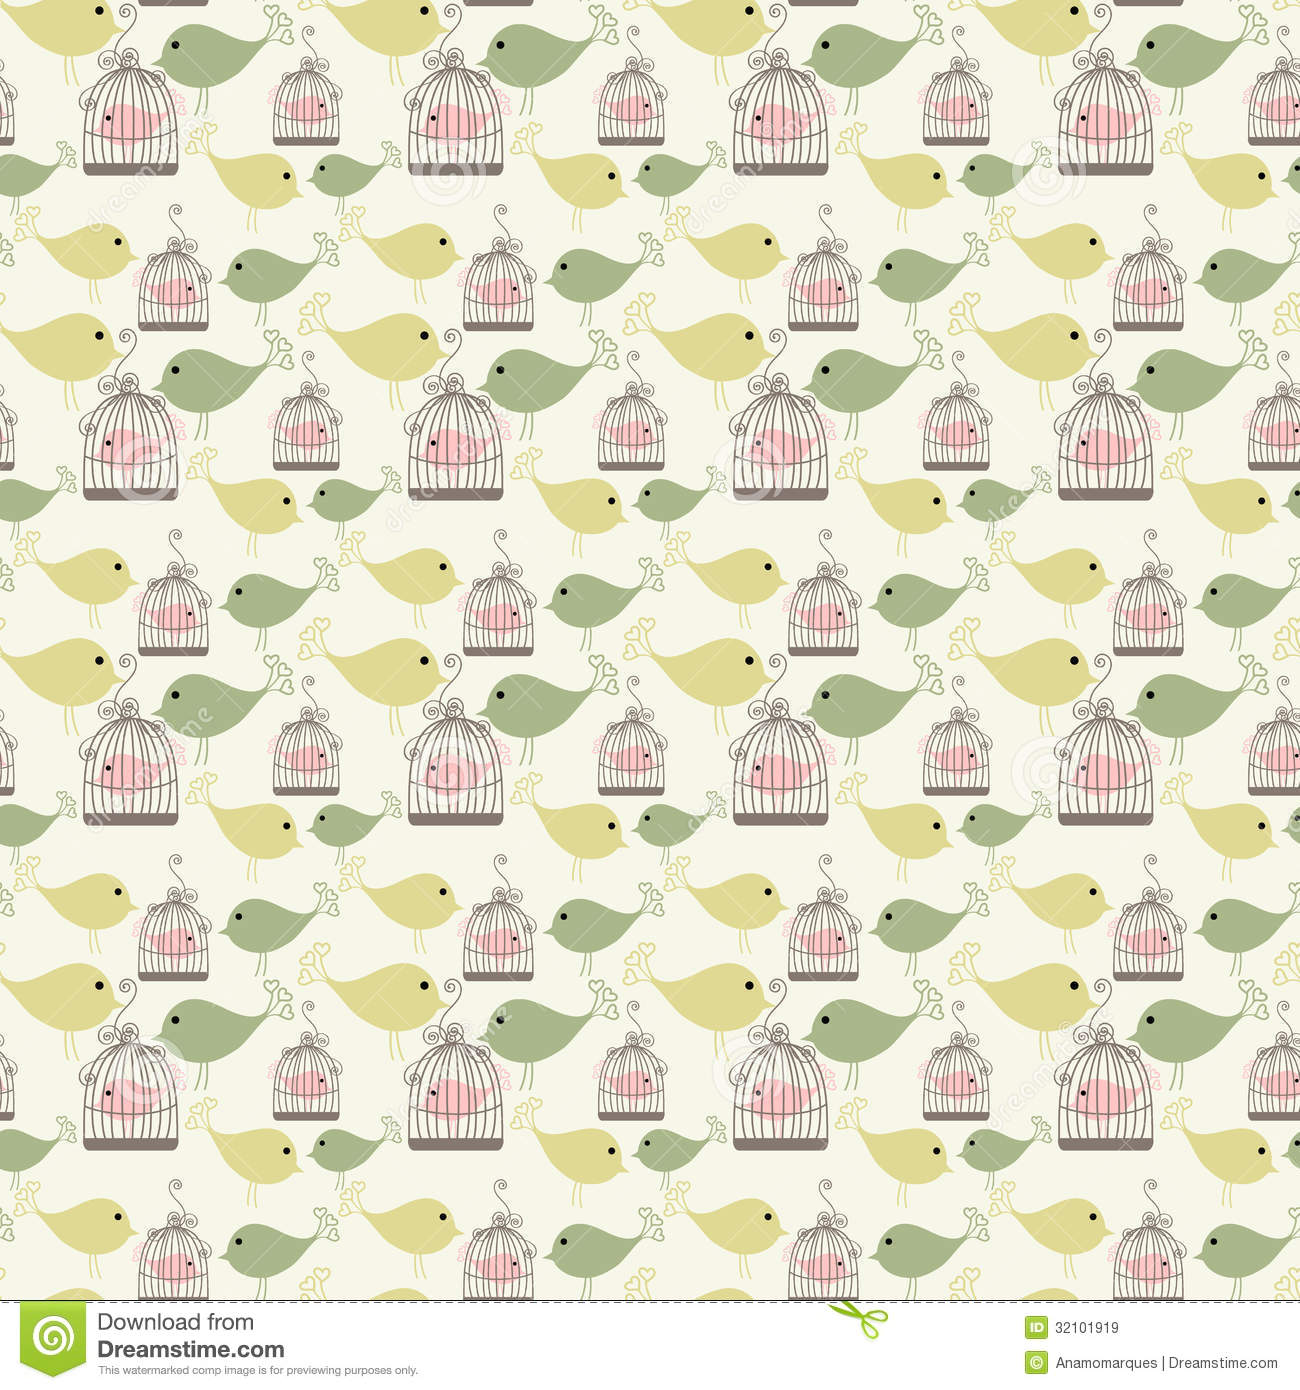 Vintage Bird Wallpaper Pattern Amazing Wallpapers 1300x1390